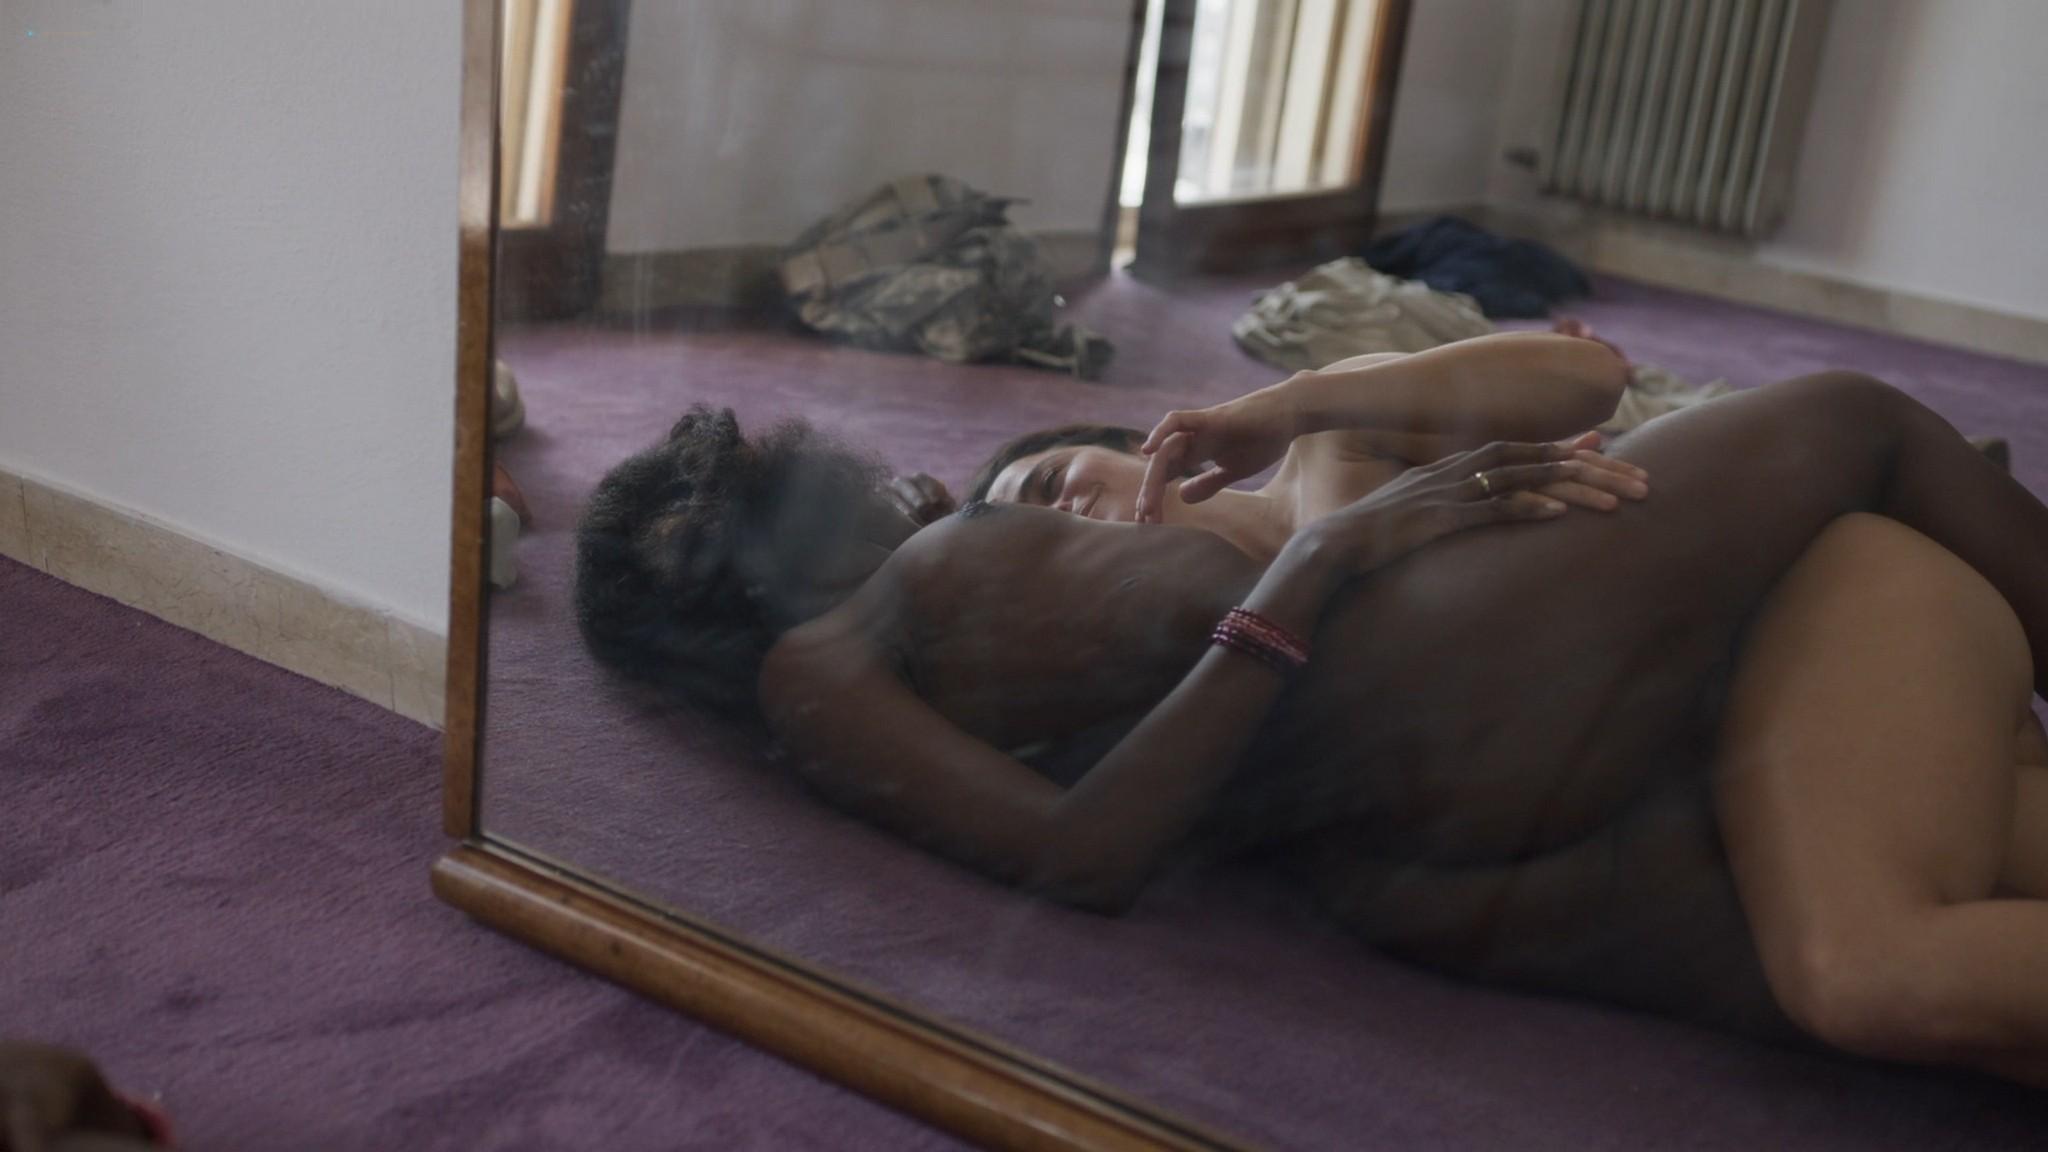 Alice Braga nude lesbian sex with Faith Alabi Chloe Sevigny sexy We Are Who We Are 2020 s1e5 HD 1080p 007